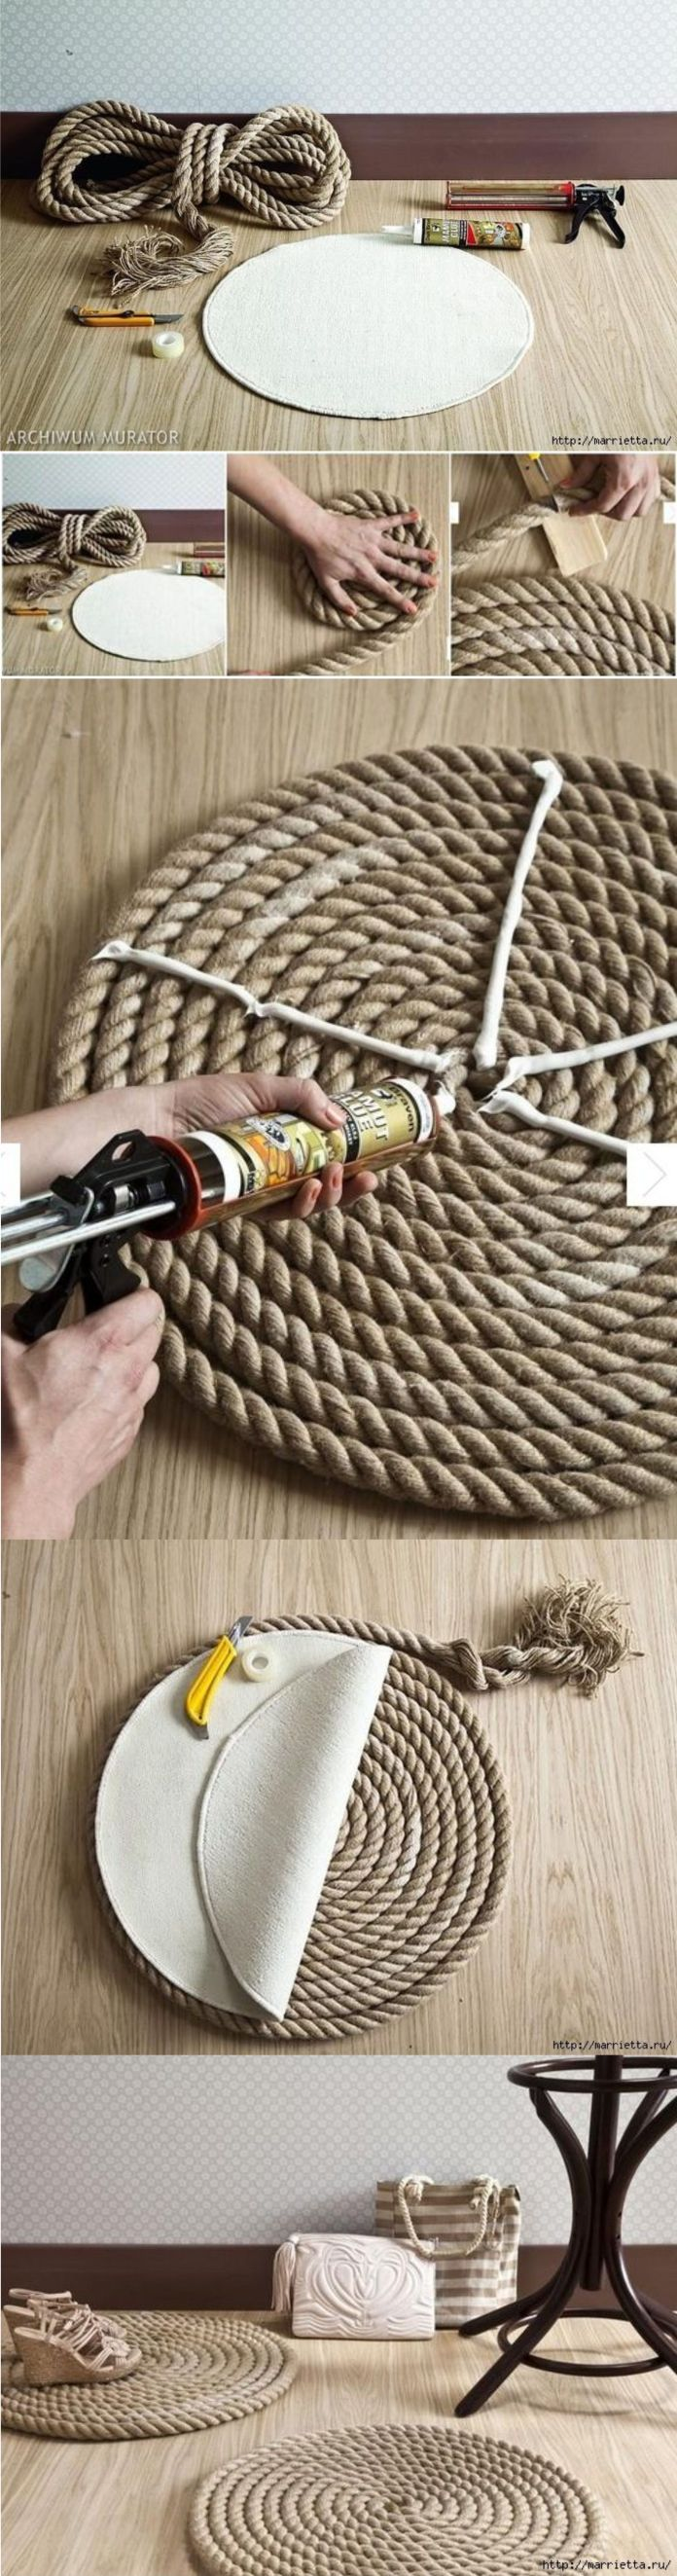 alfombra-cuerda